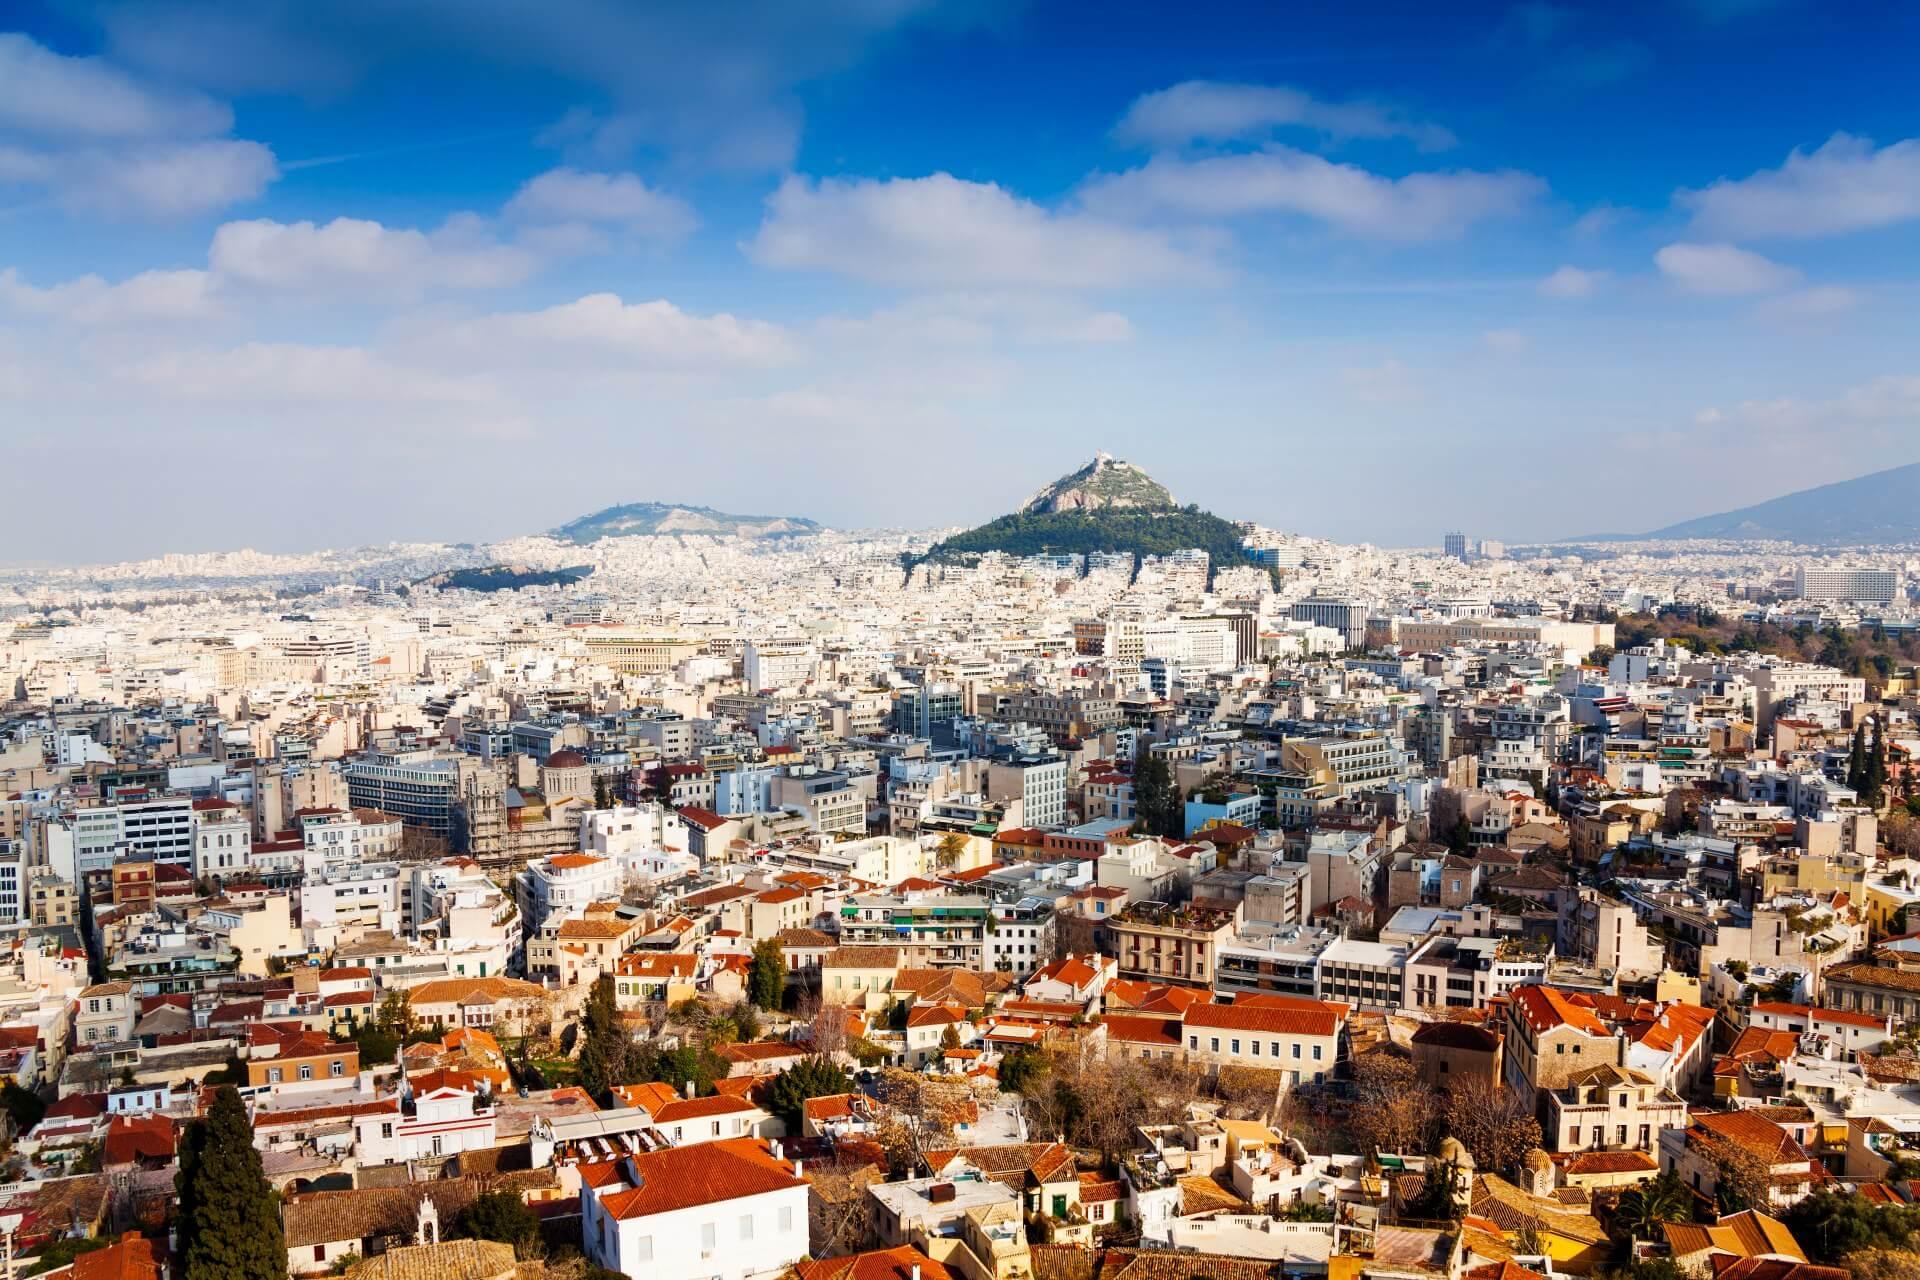 Цунамі Airbnb в Афінах. Кукакі – в топі!